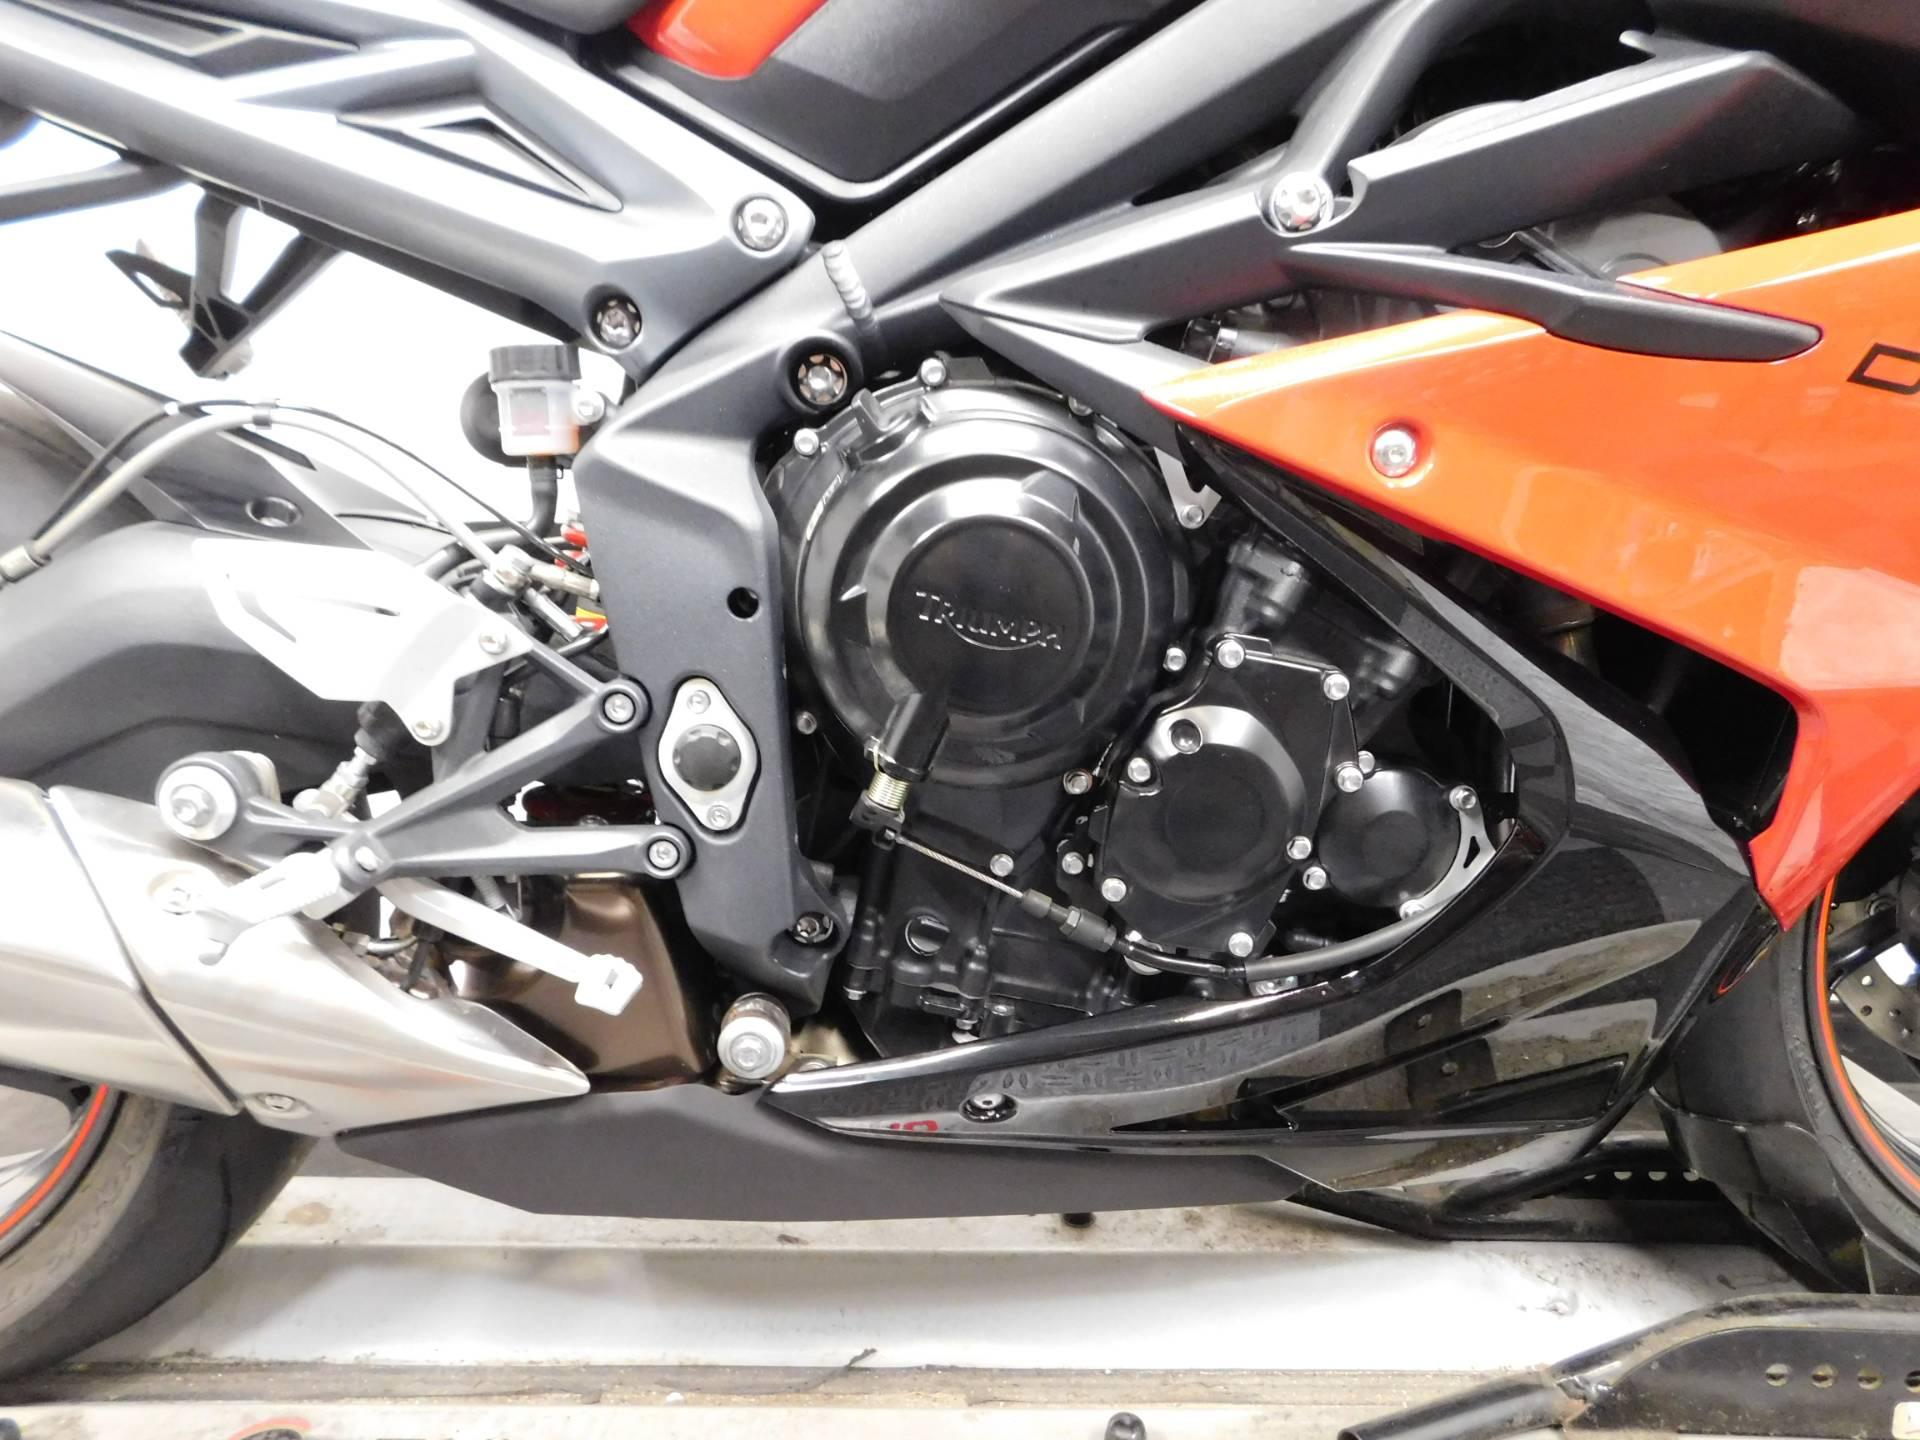 Used 2015 Triumph Daytona 675 Abs Motorcycles In Eden Prairie Mn